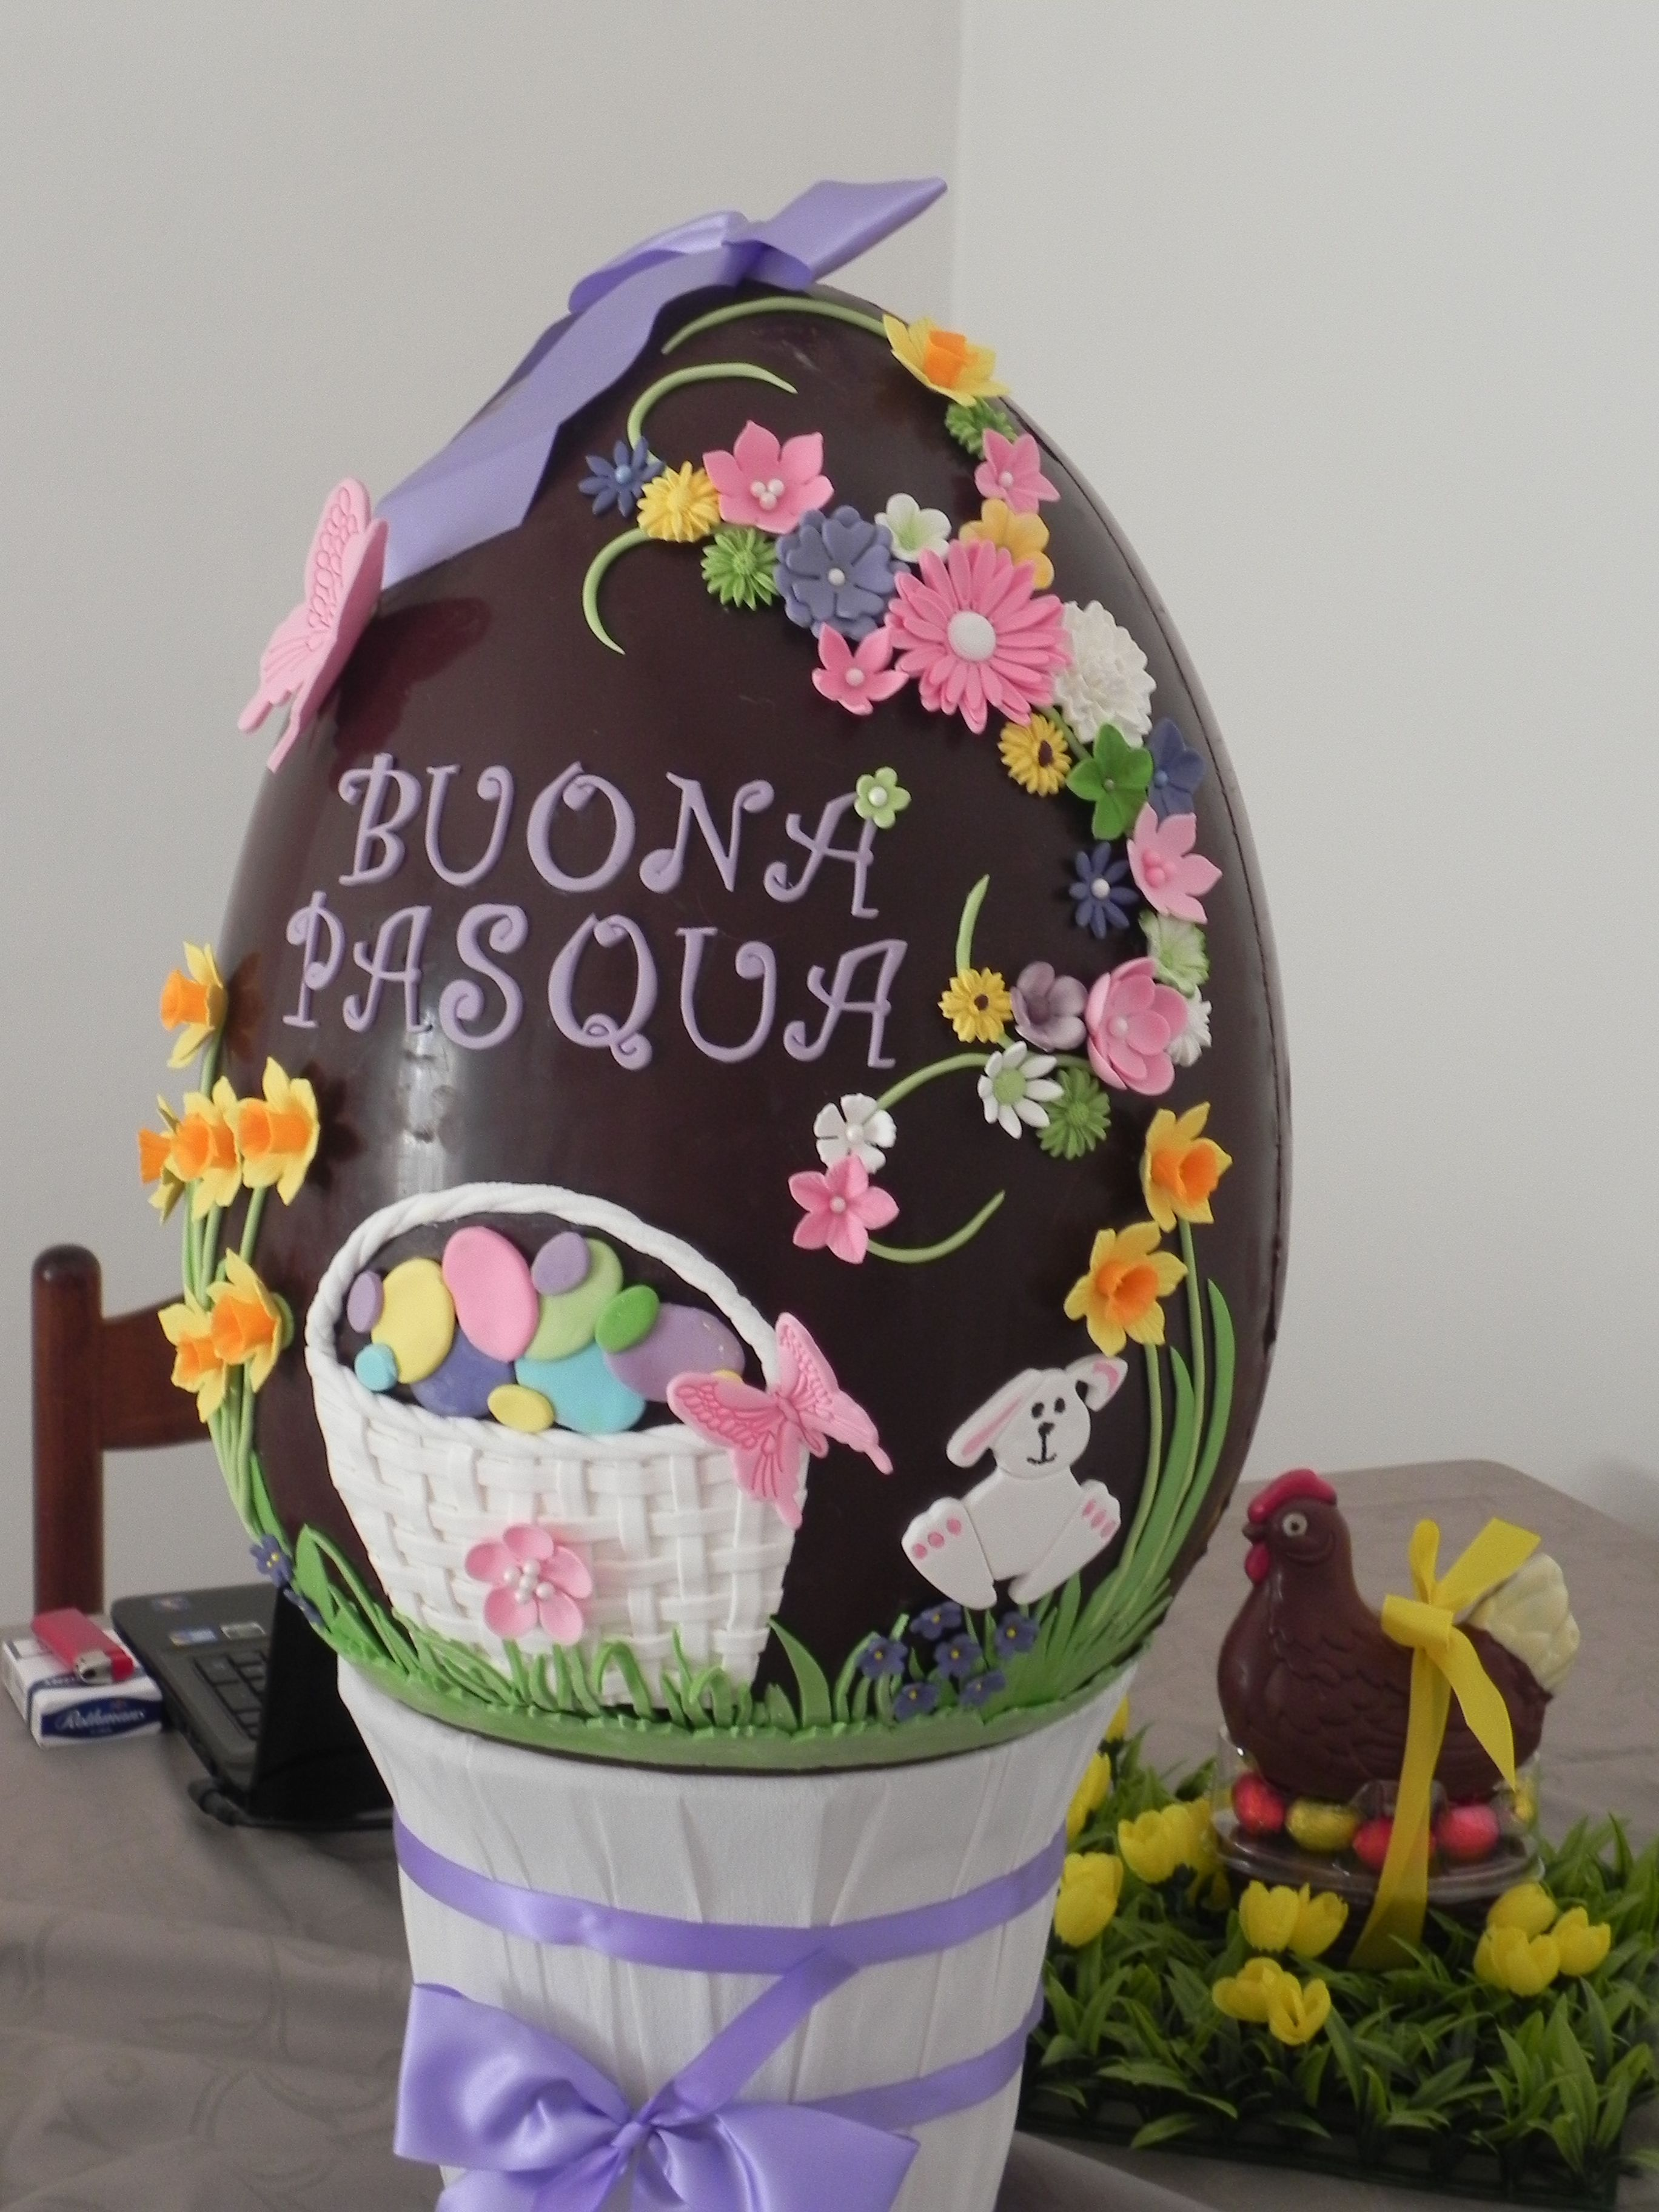 uovo pasqua easter egg